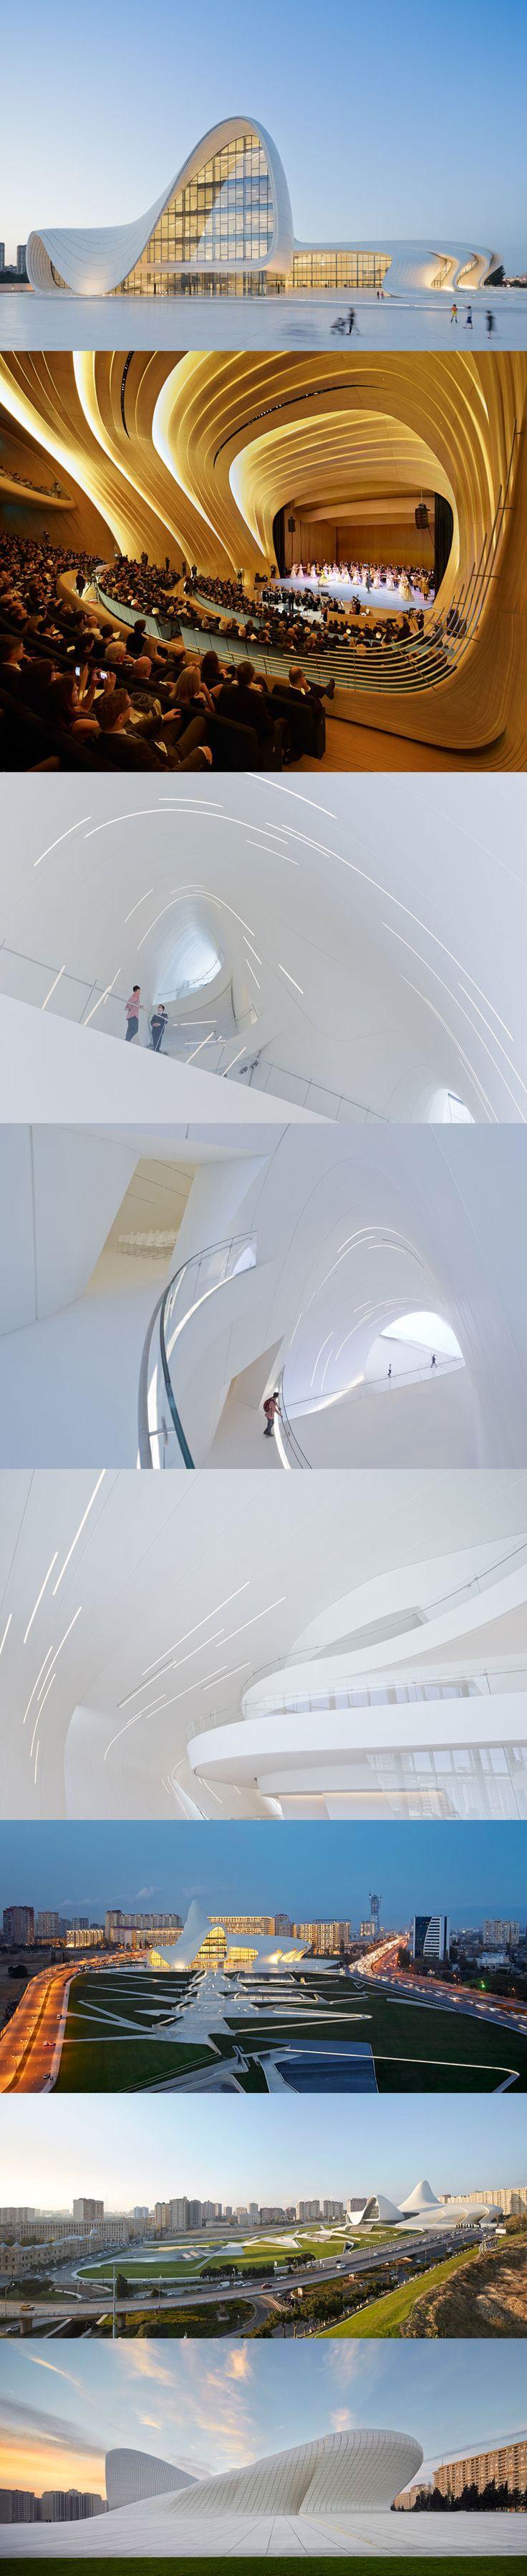 zaha-hadid-heydar-aliyev-center-designboom